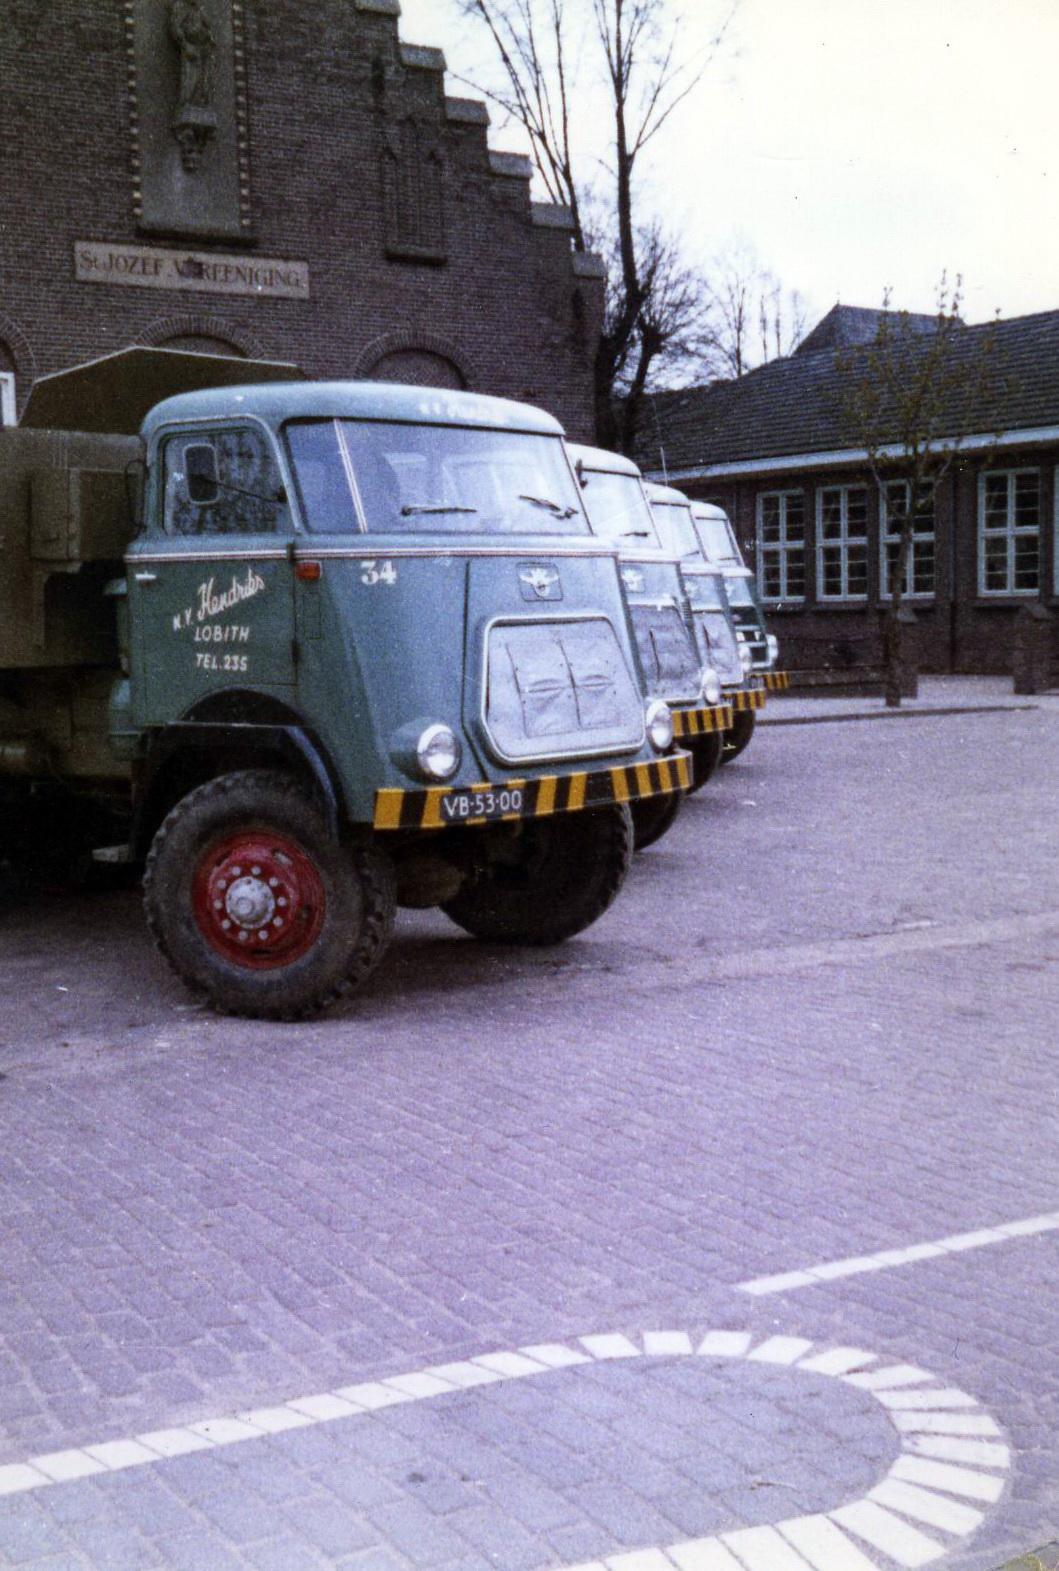 Hendriks-Lobith-5x-DAF-1900-8